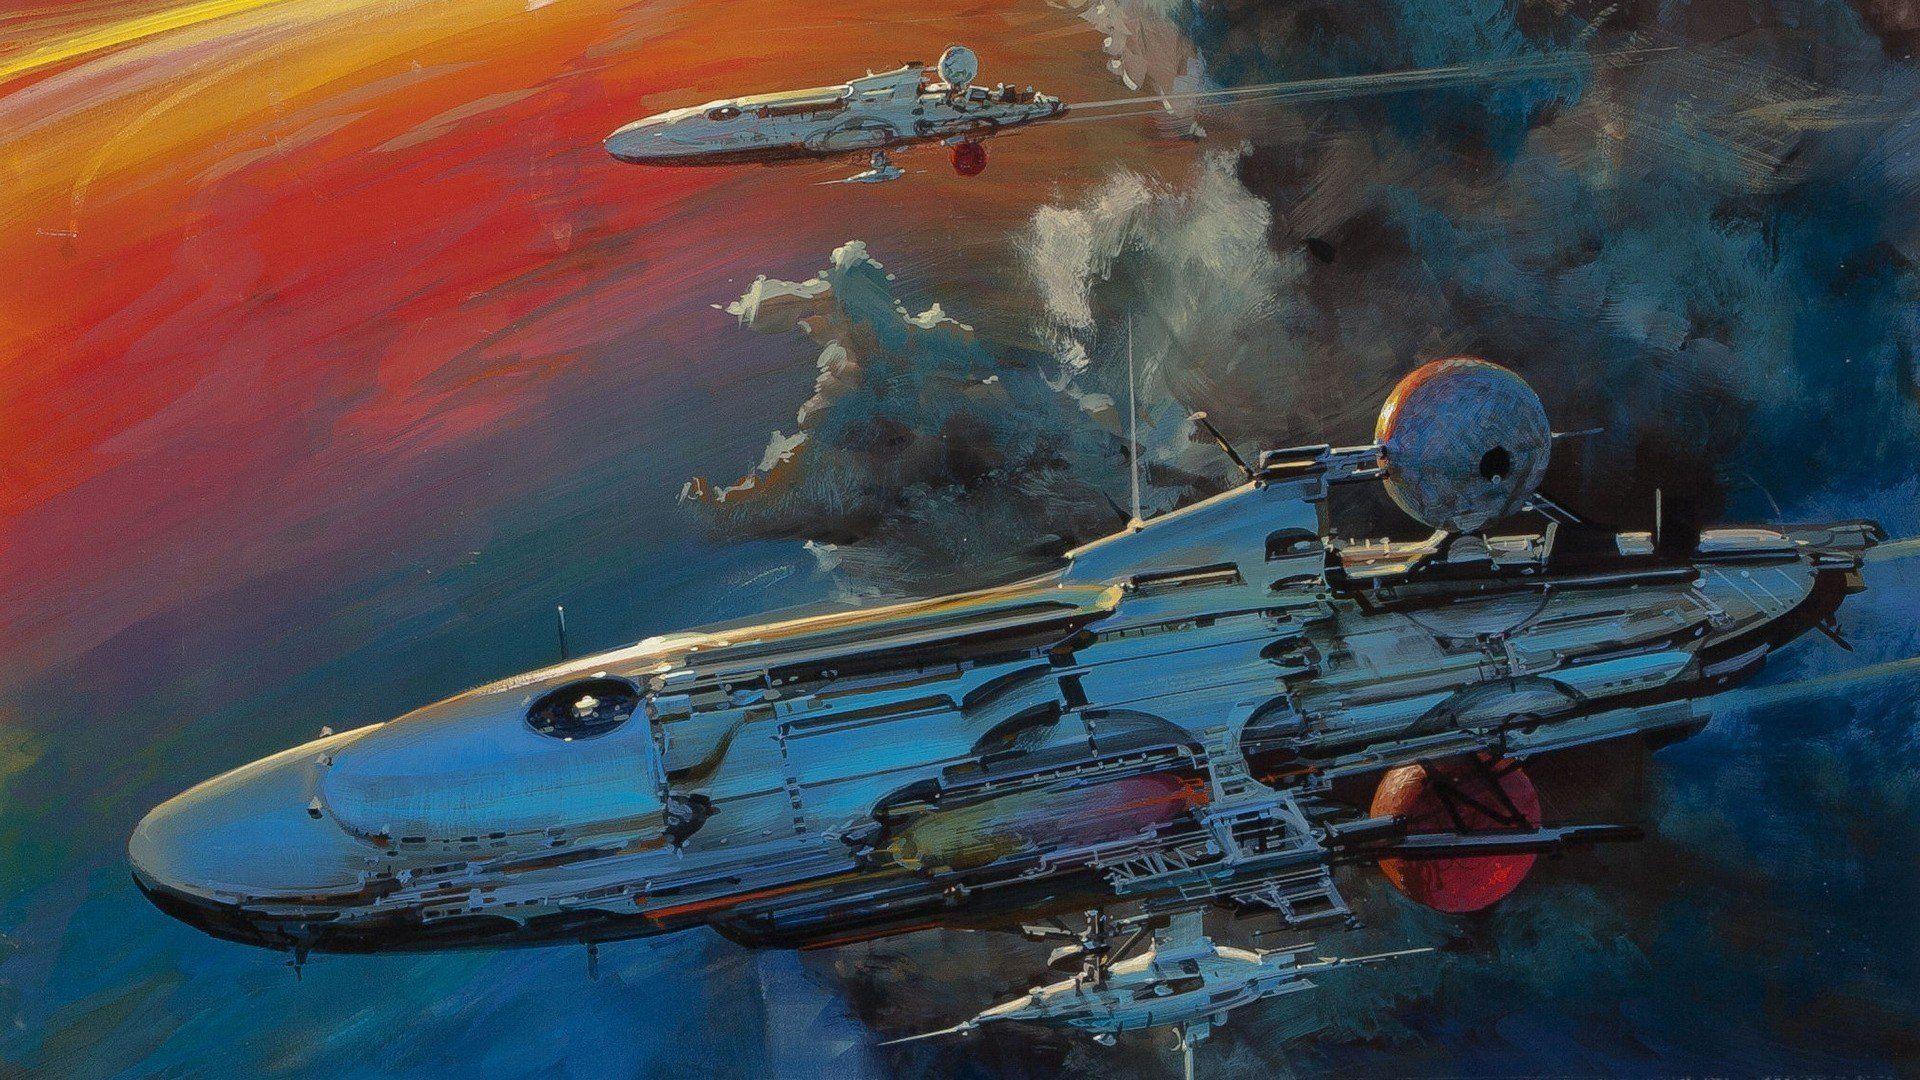 Artwork Spaceships Space Concept Art Fantasy Art Science